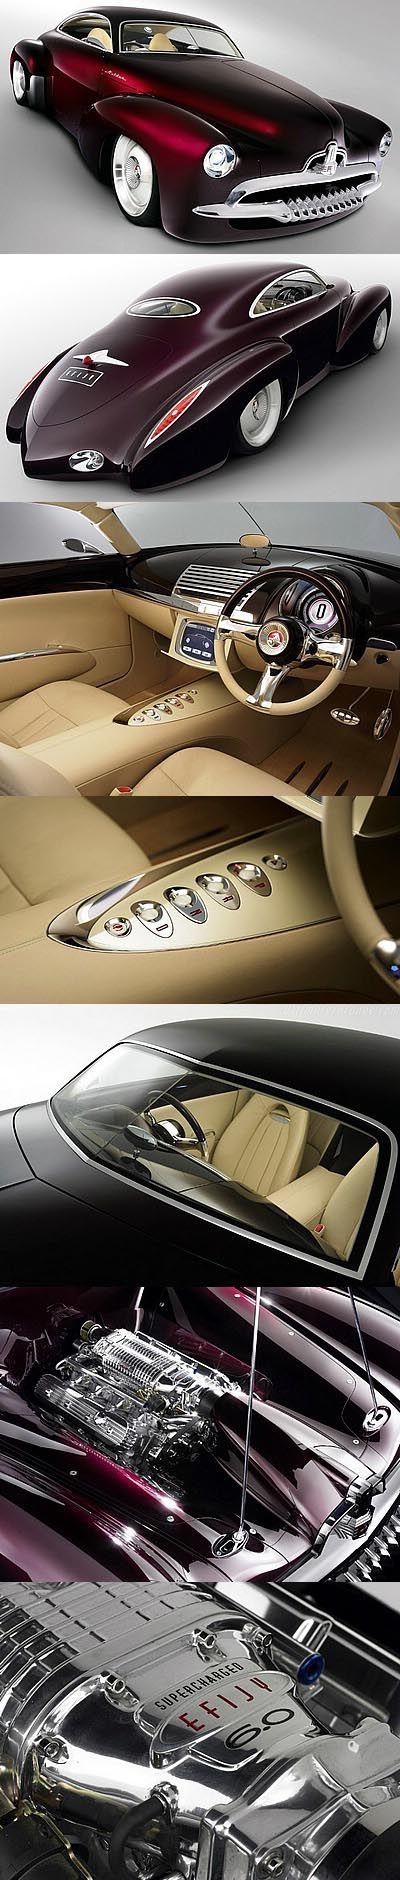 Holden Efijy Concept Car A wild 21st Century hot rod